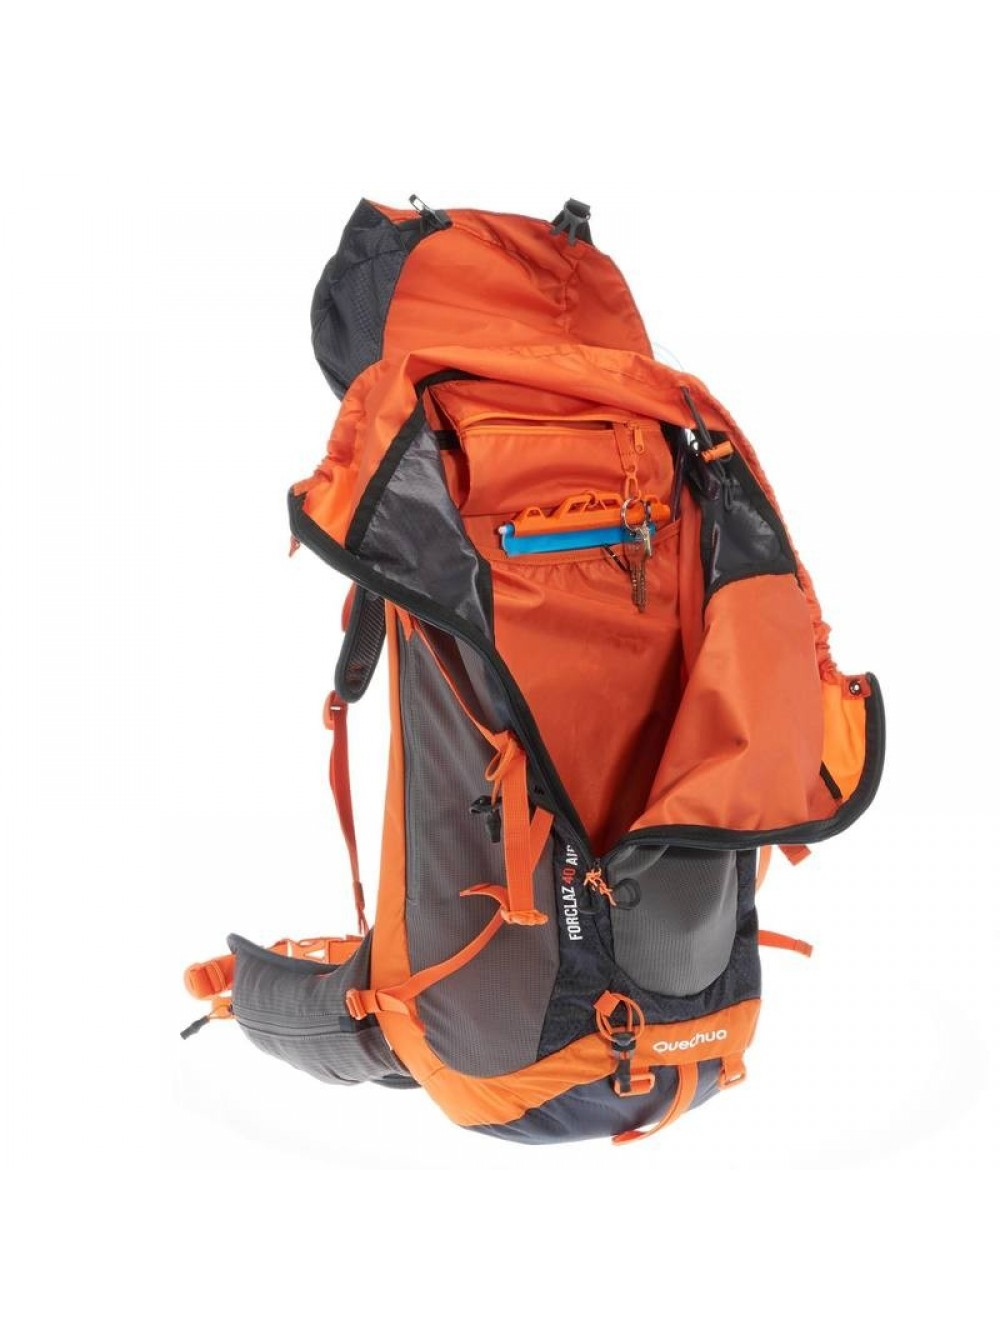 460cebfd0b Quechua Forclaz 40 Air Hiking Backpack